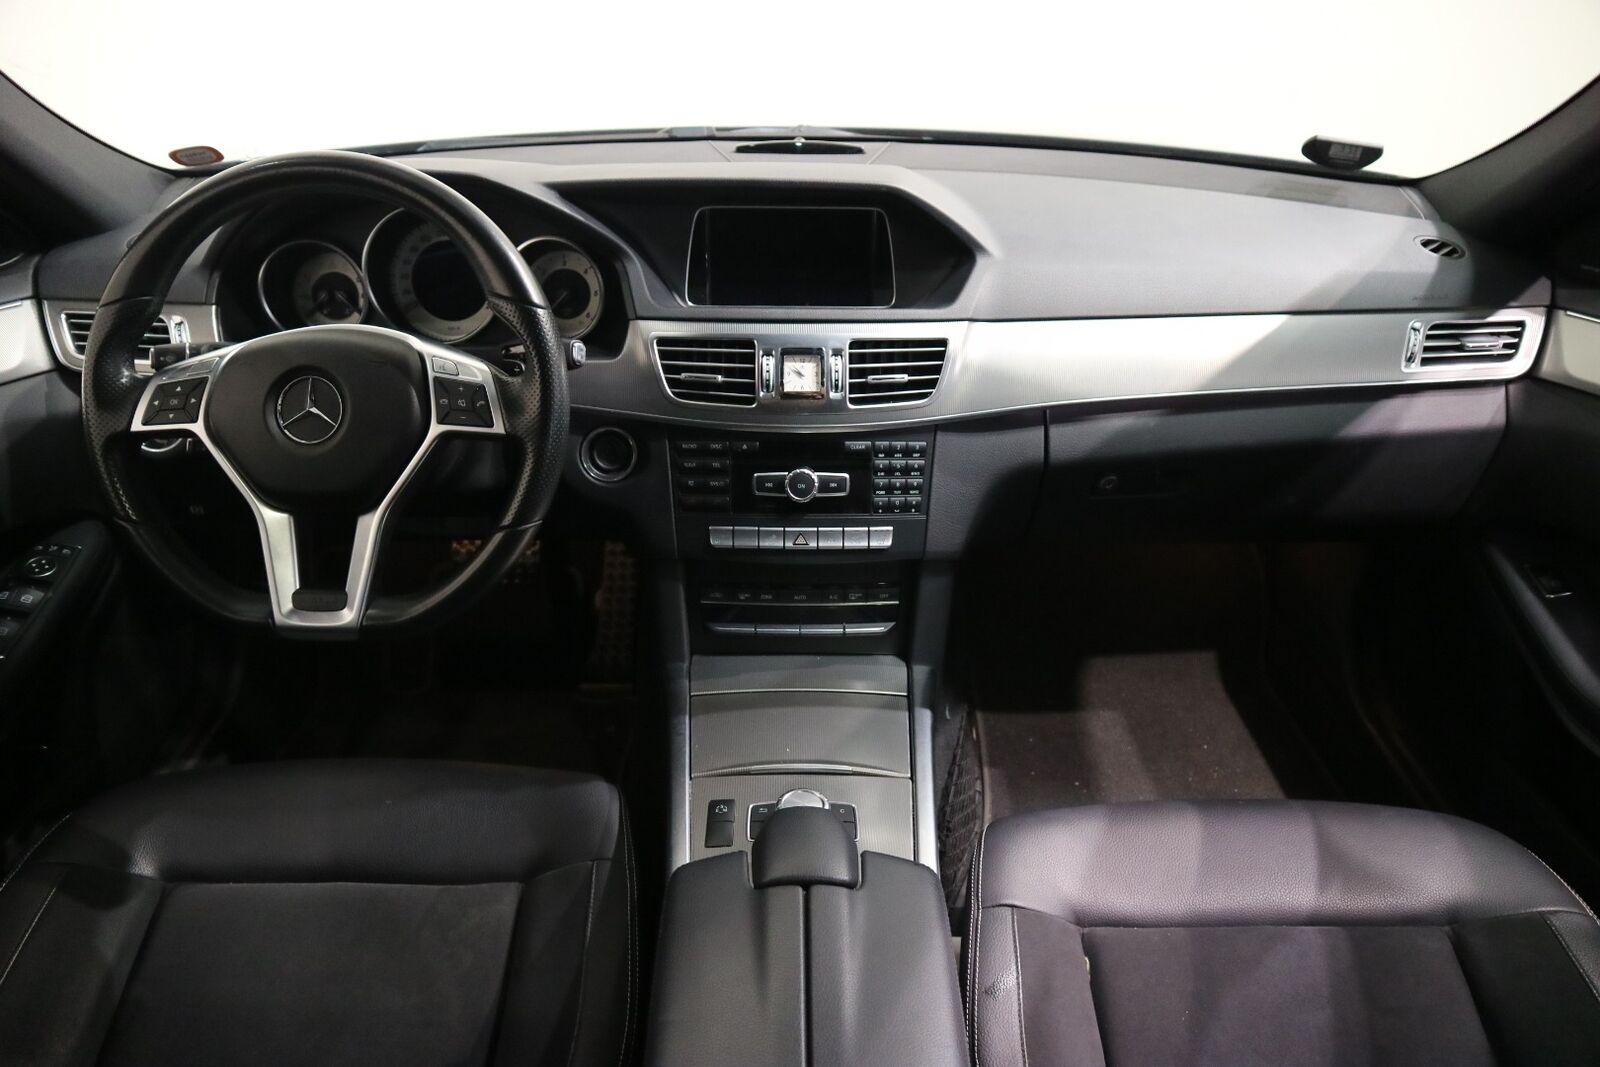 Mercedes E220 2,2 CDi Avantgarde AMG stc. aut. - billede 7